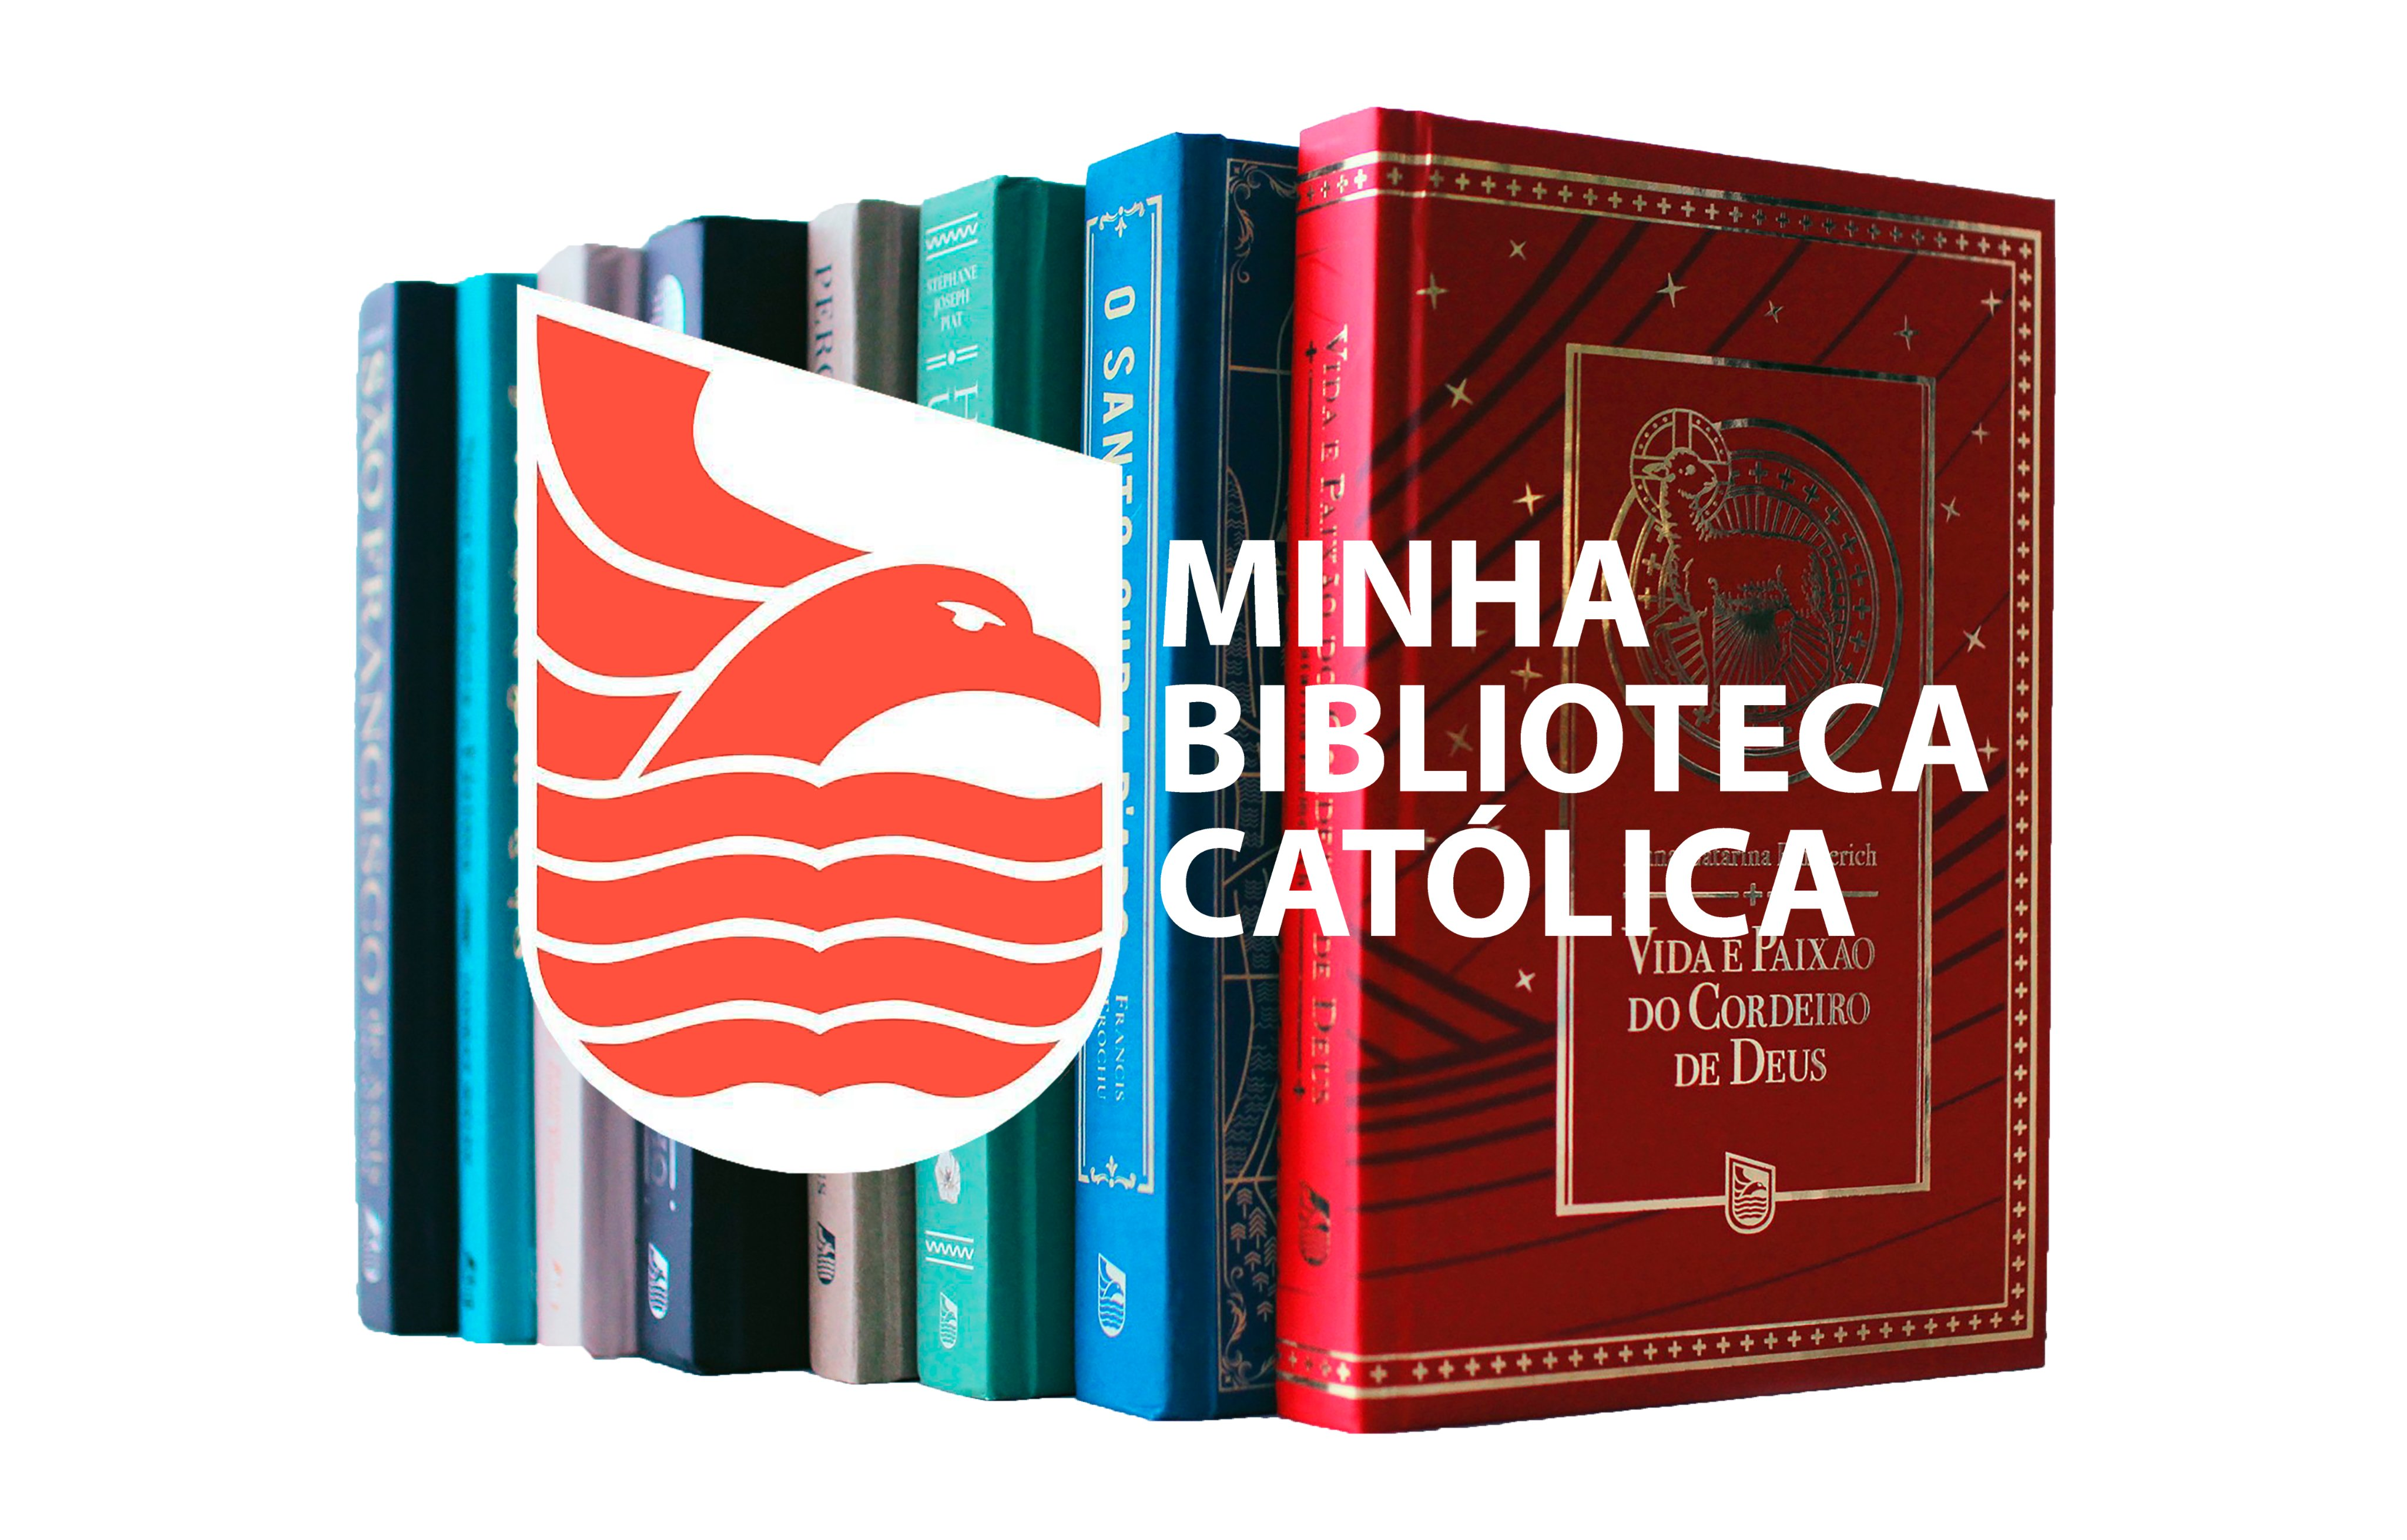 Minha Biblioteca Católica